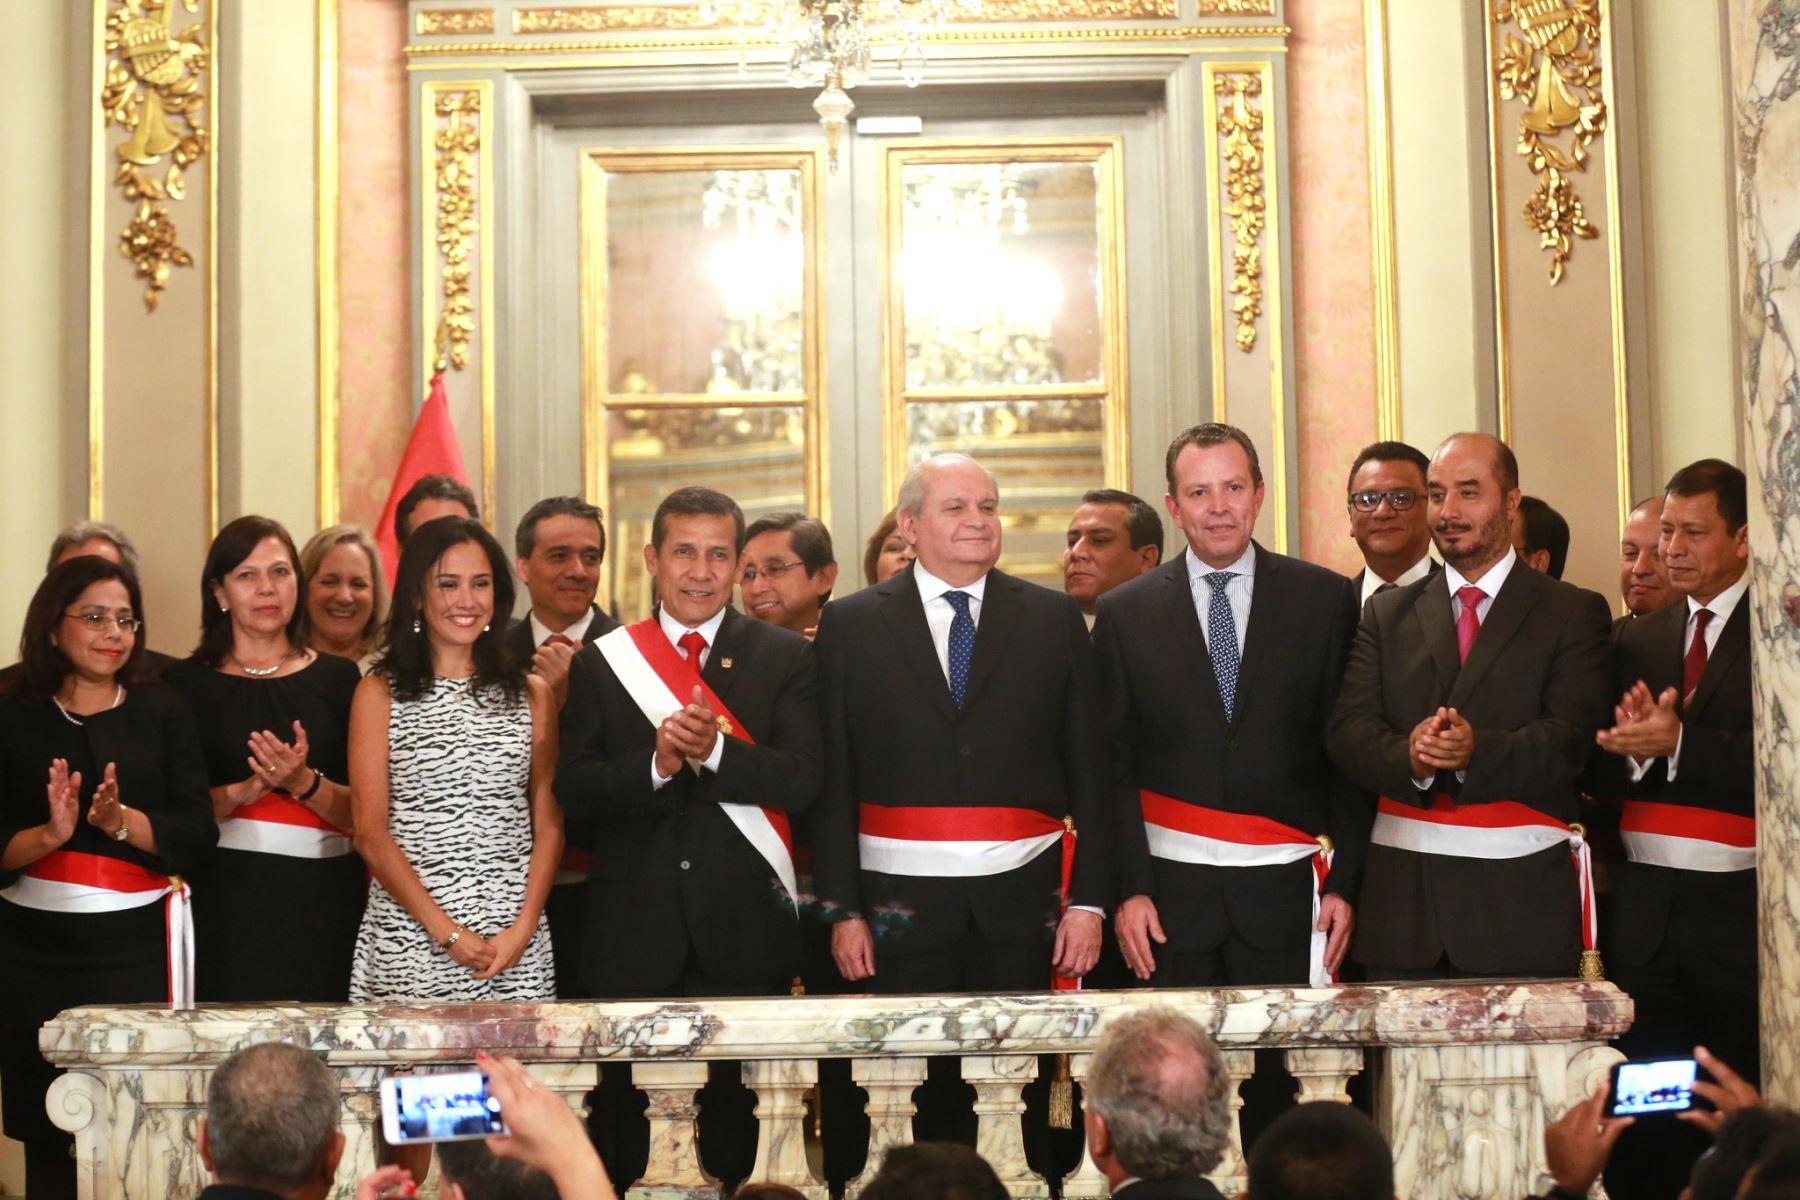 Presidente Humala junto al nuevo Gabinete ministerial encabezado por Pedro Cateriano Bellido. Foto: Presidencia.